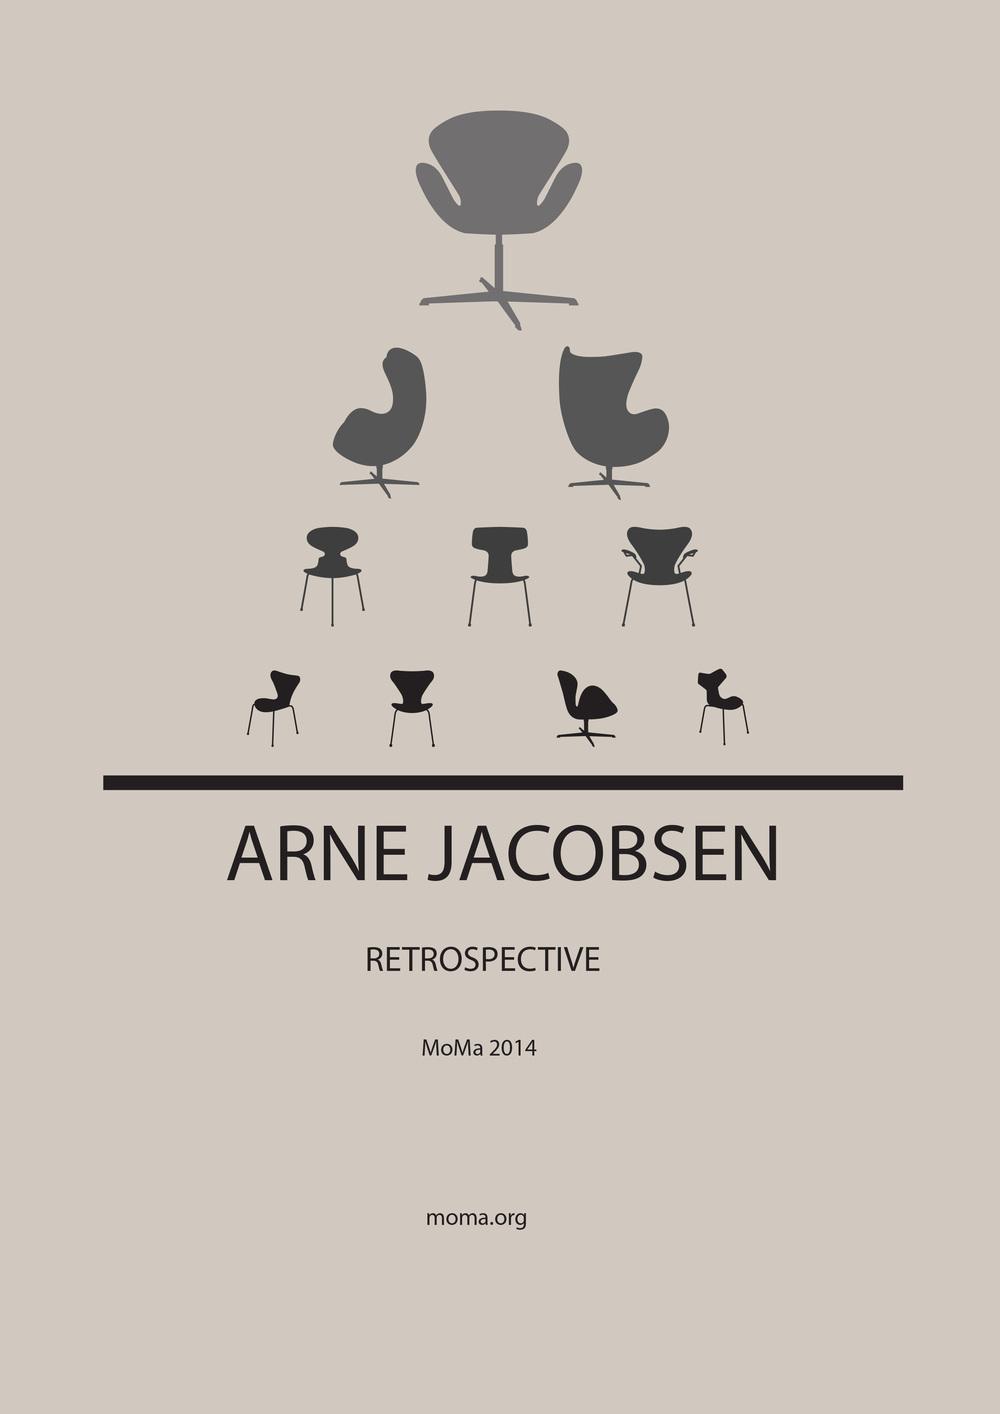 Furniture Design Poster exellent furniture design poster century decor retro nursery art